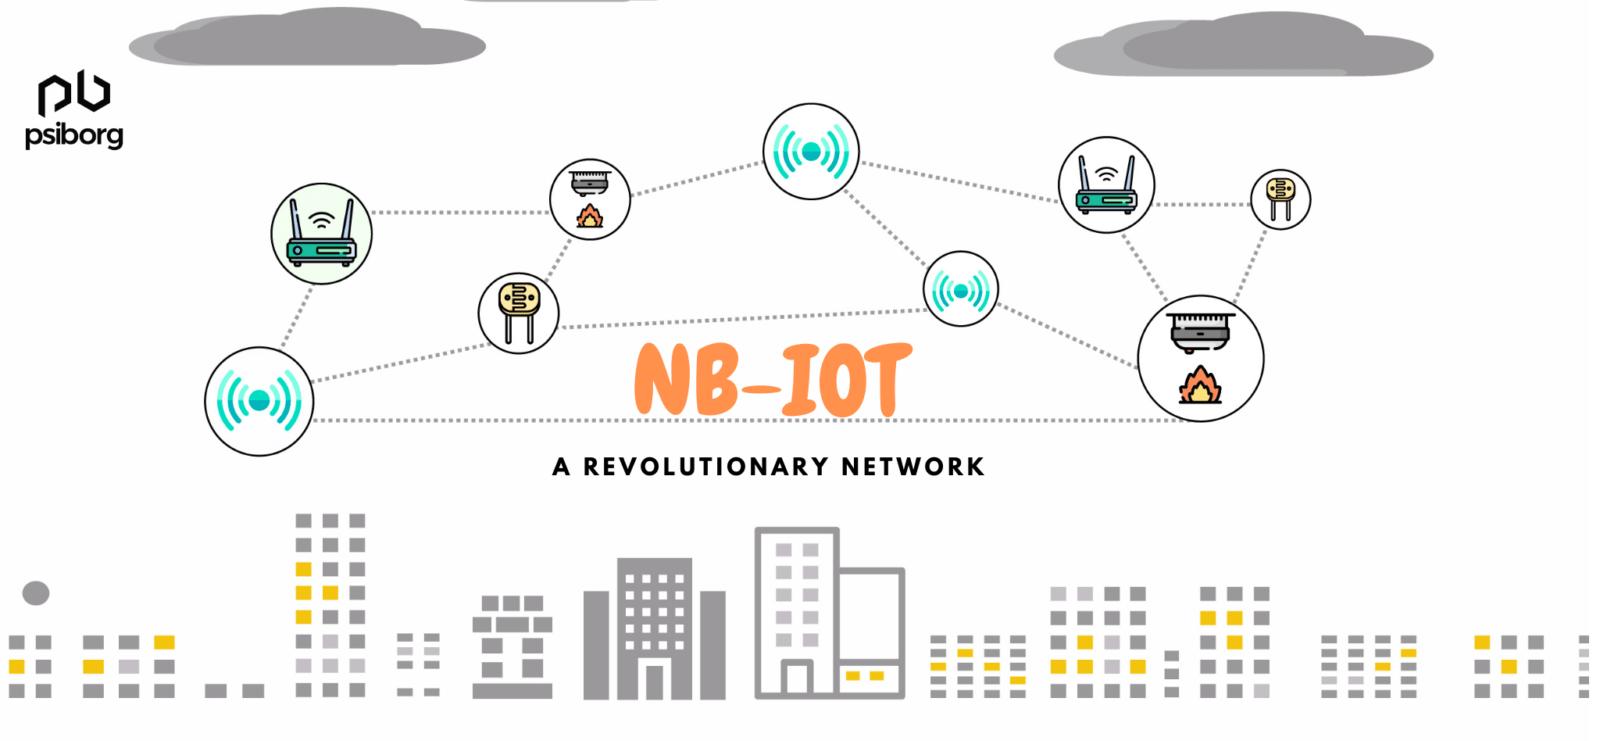 NBIoT - Narrow band internet of things